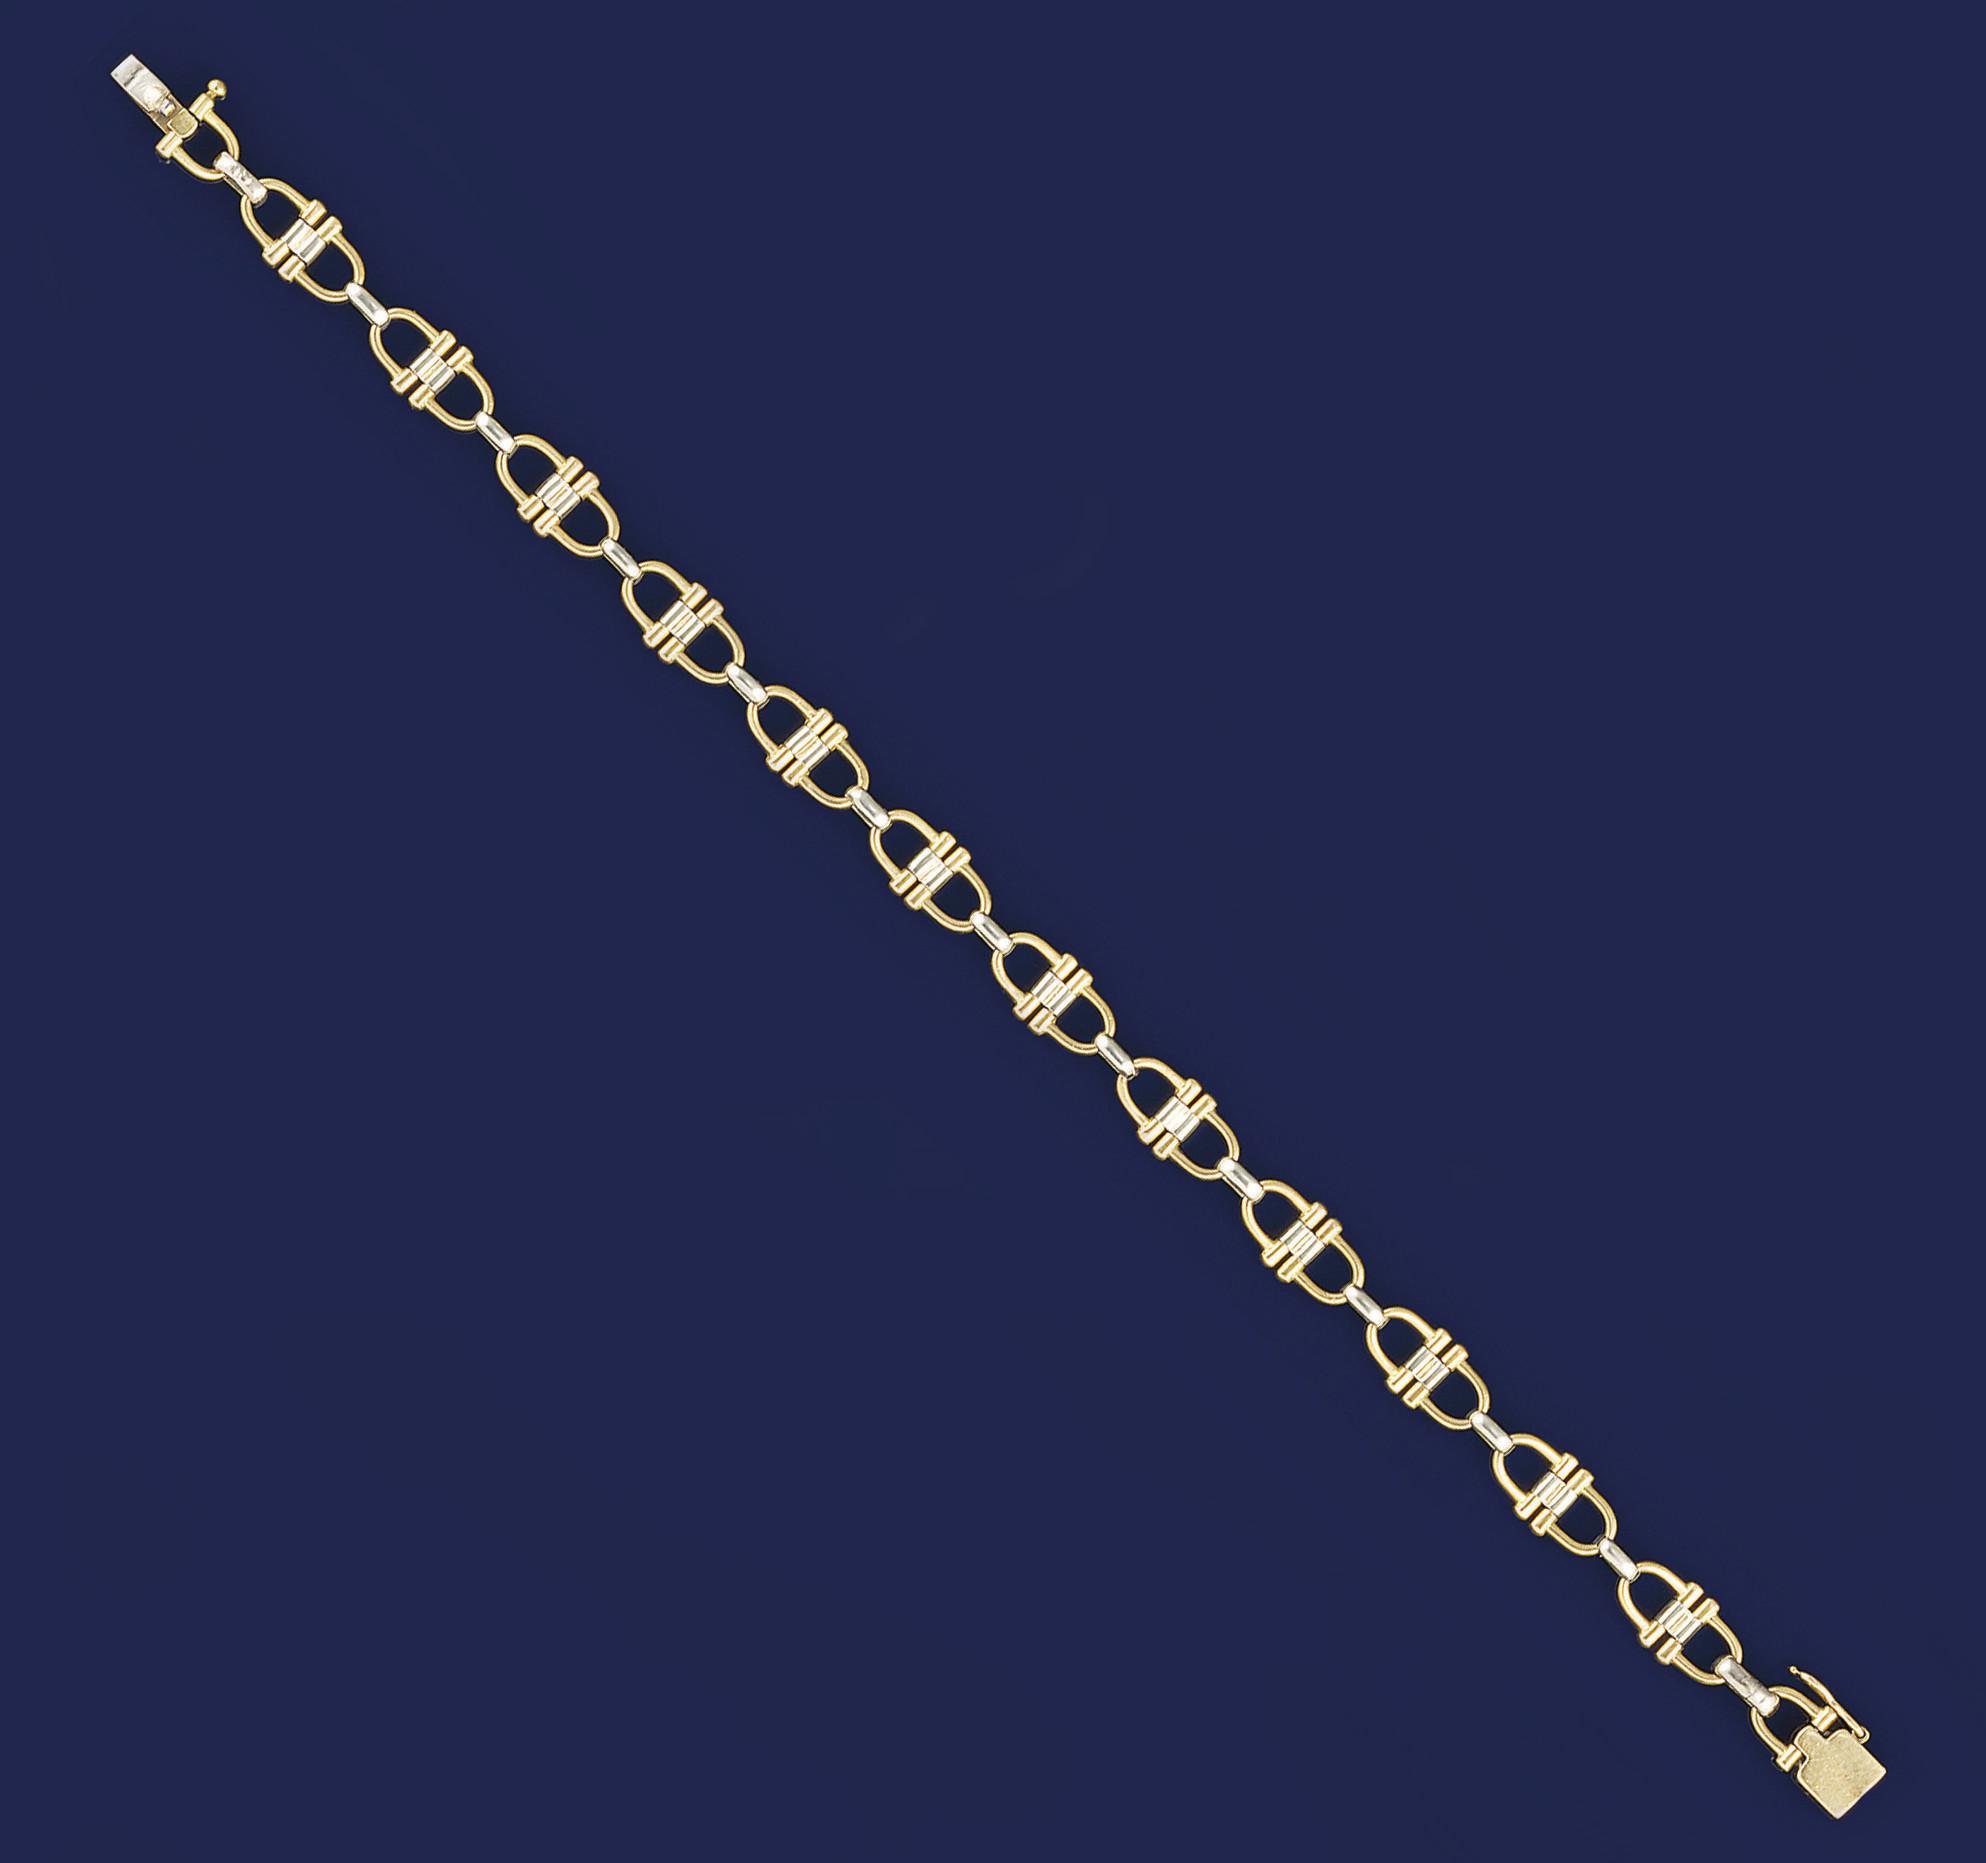 An 18ct. two colour gold brace